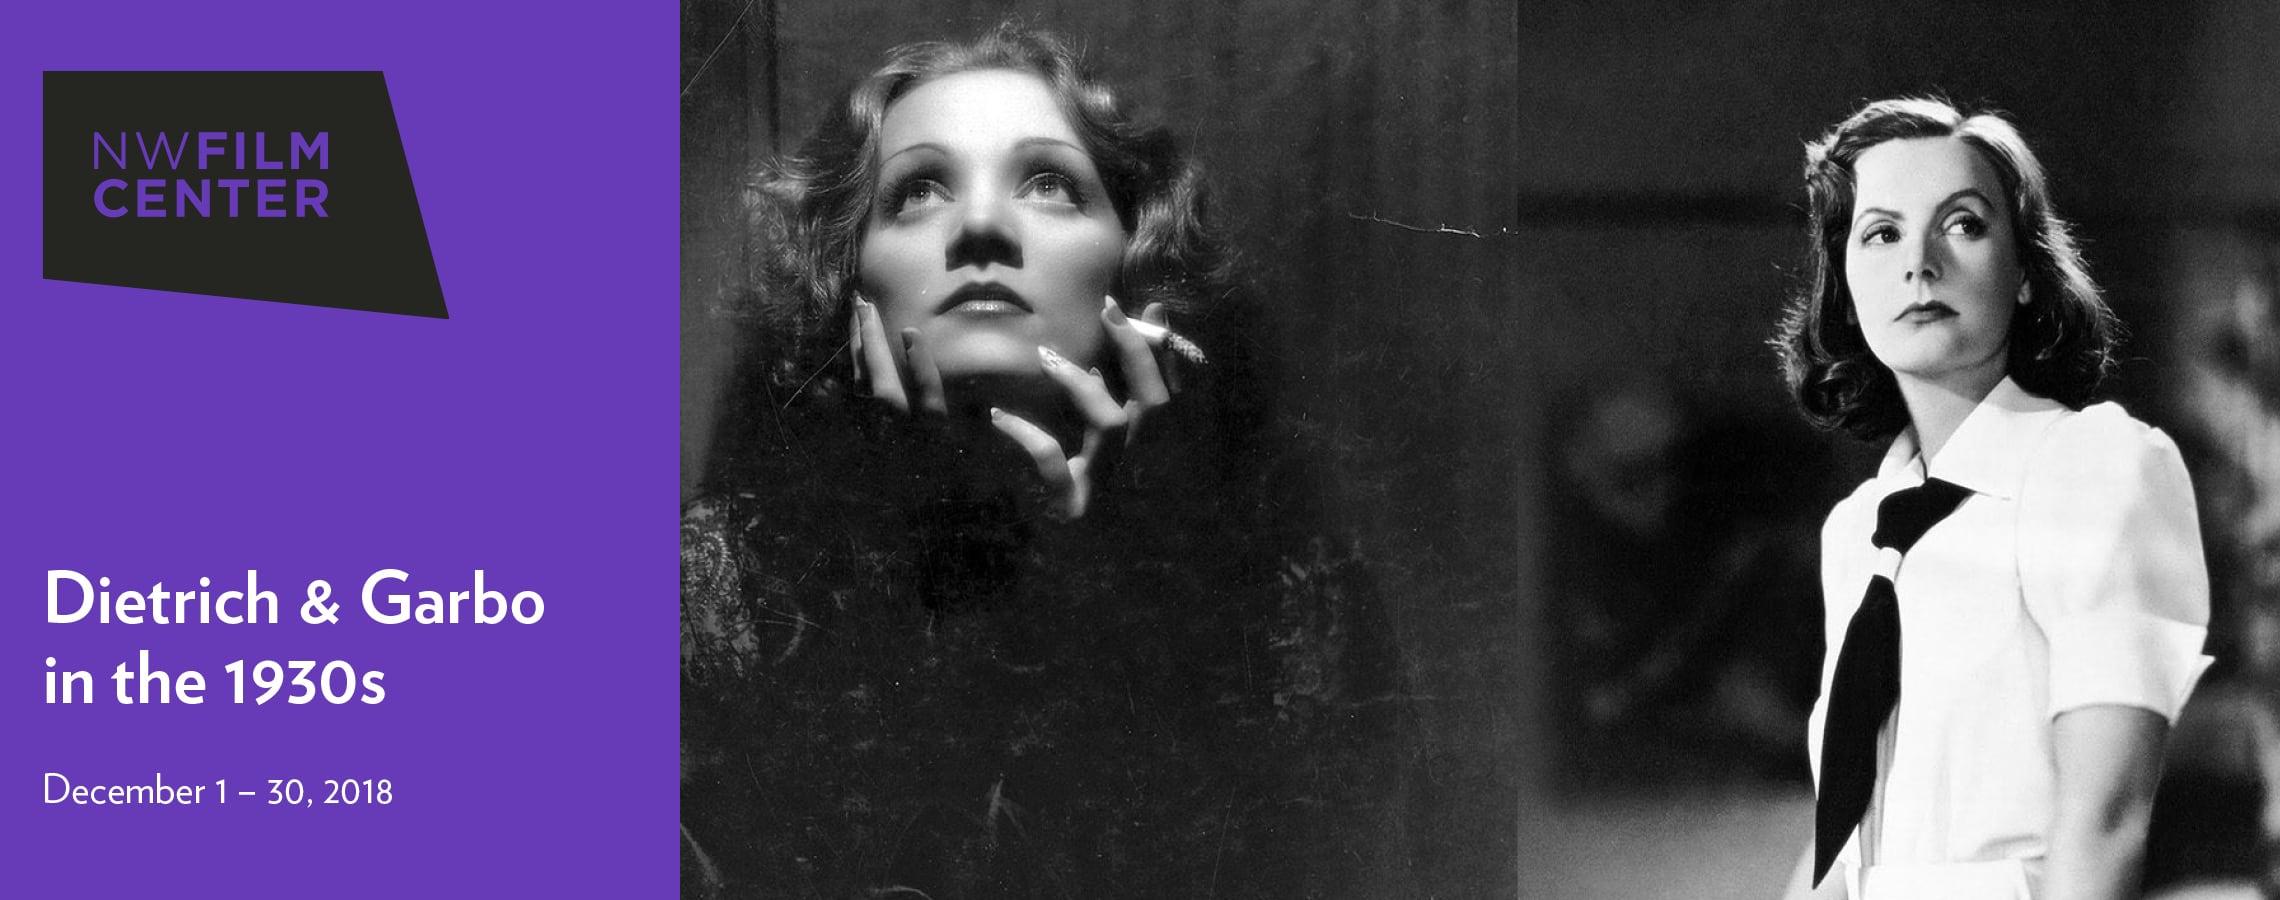 Dietrich & Garbo in the 1930s – December 1 – 30, 2018